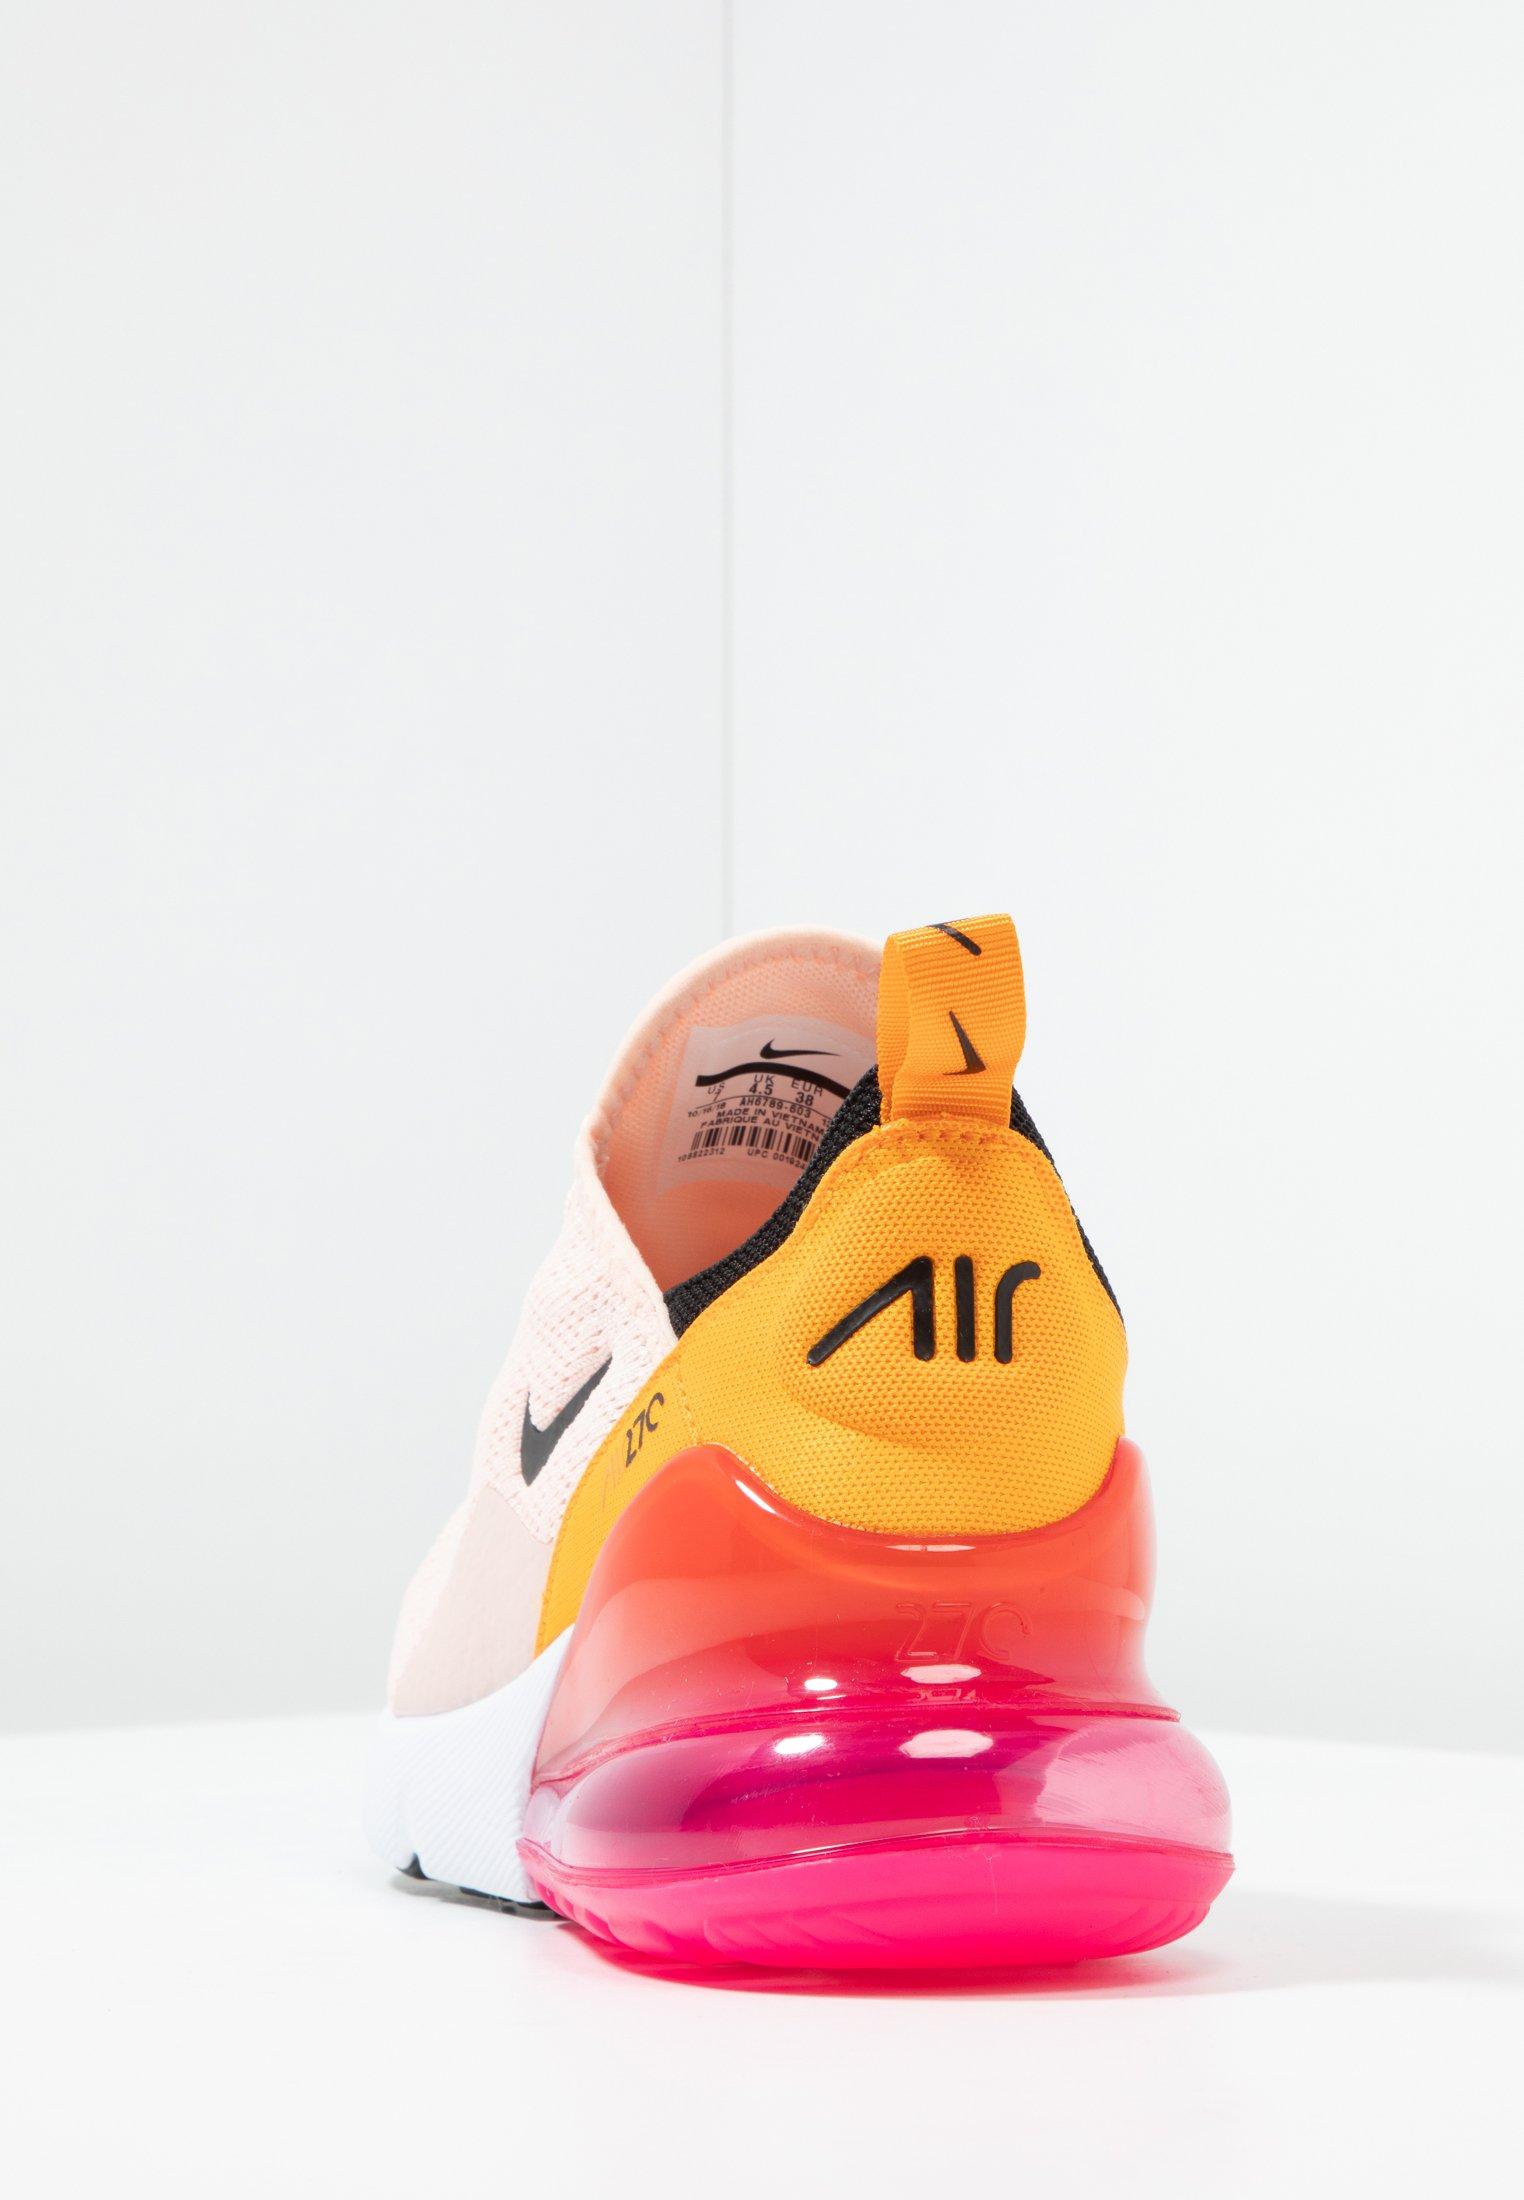 AIR MAX 270 Sneaker low washed coralblacklaser fuchsiaorange peel